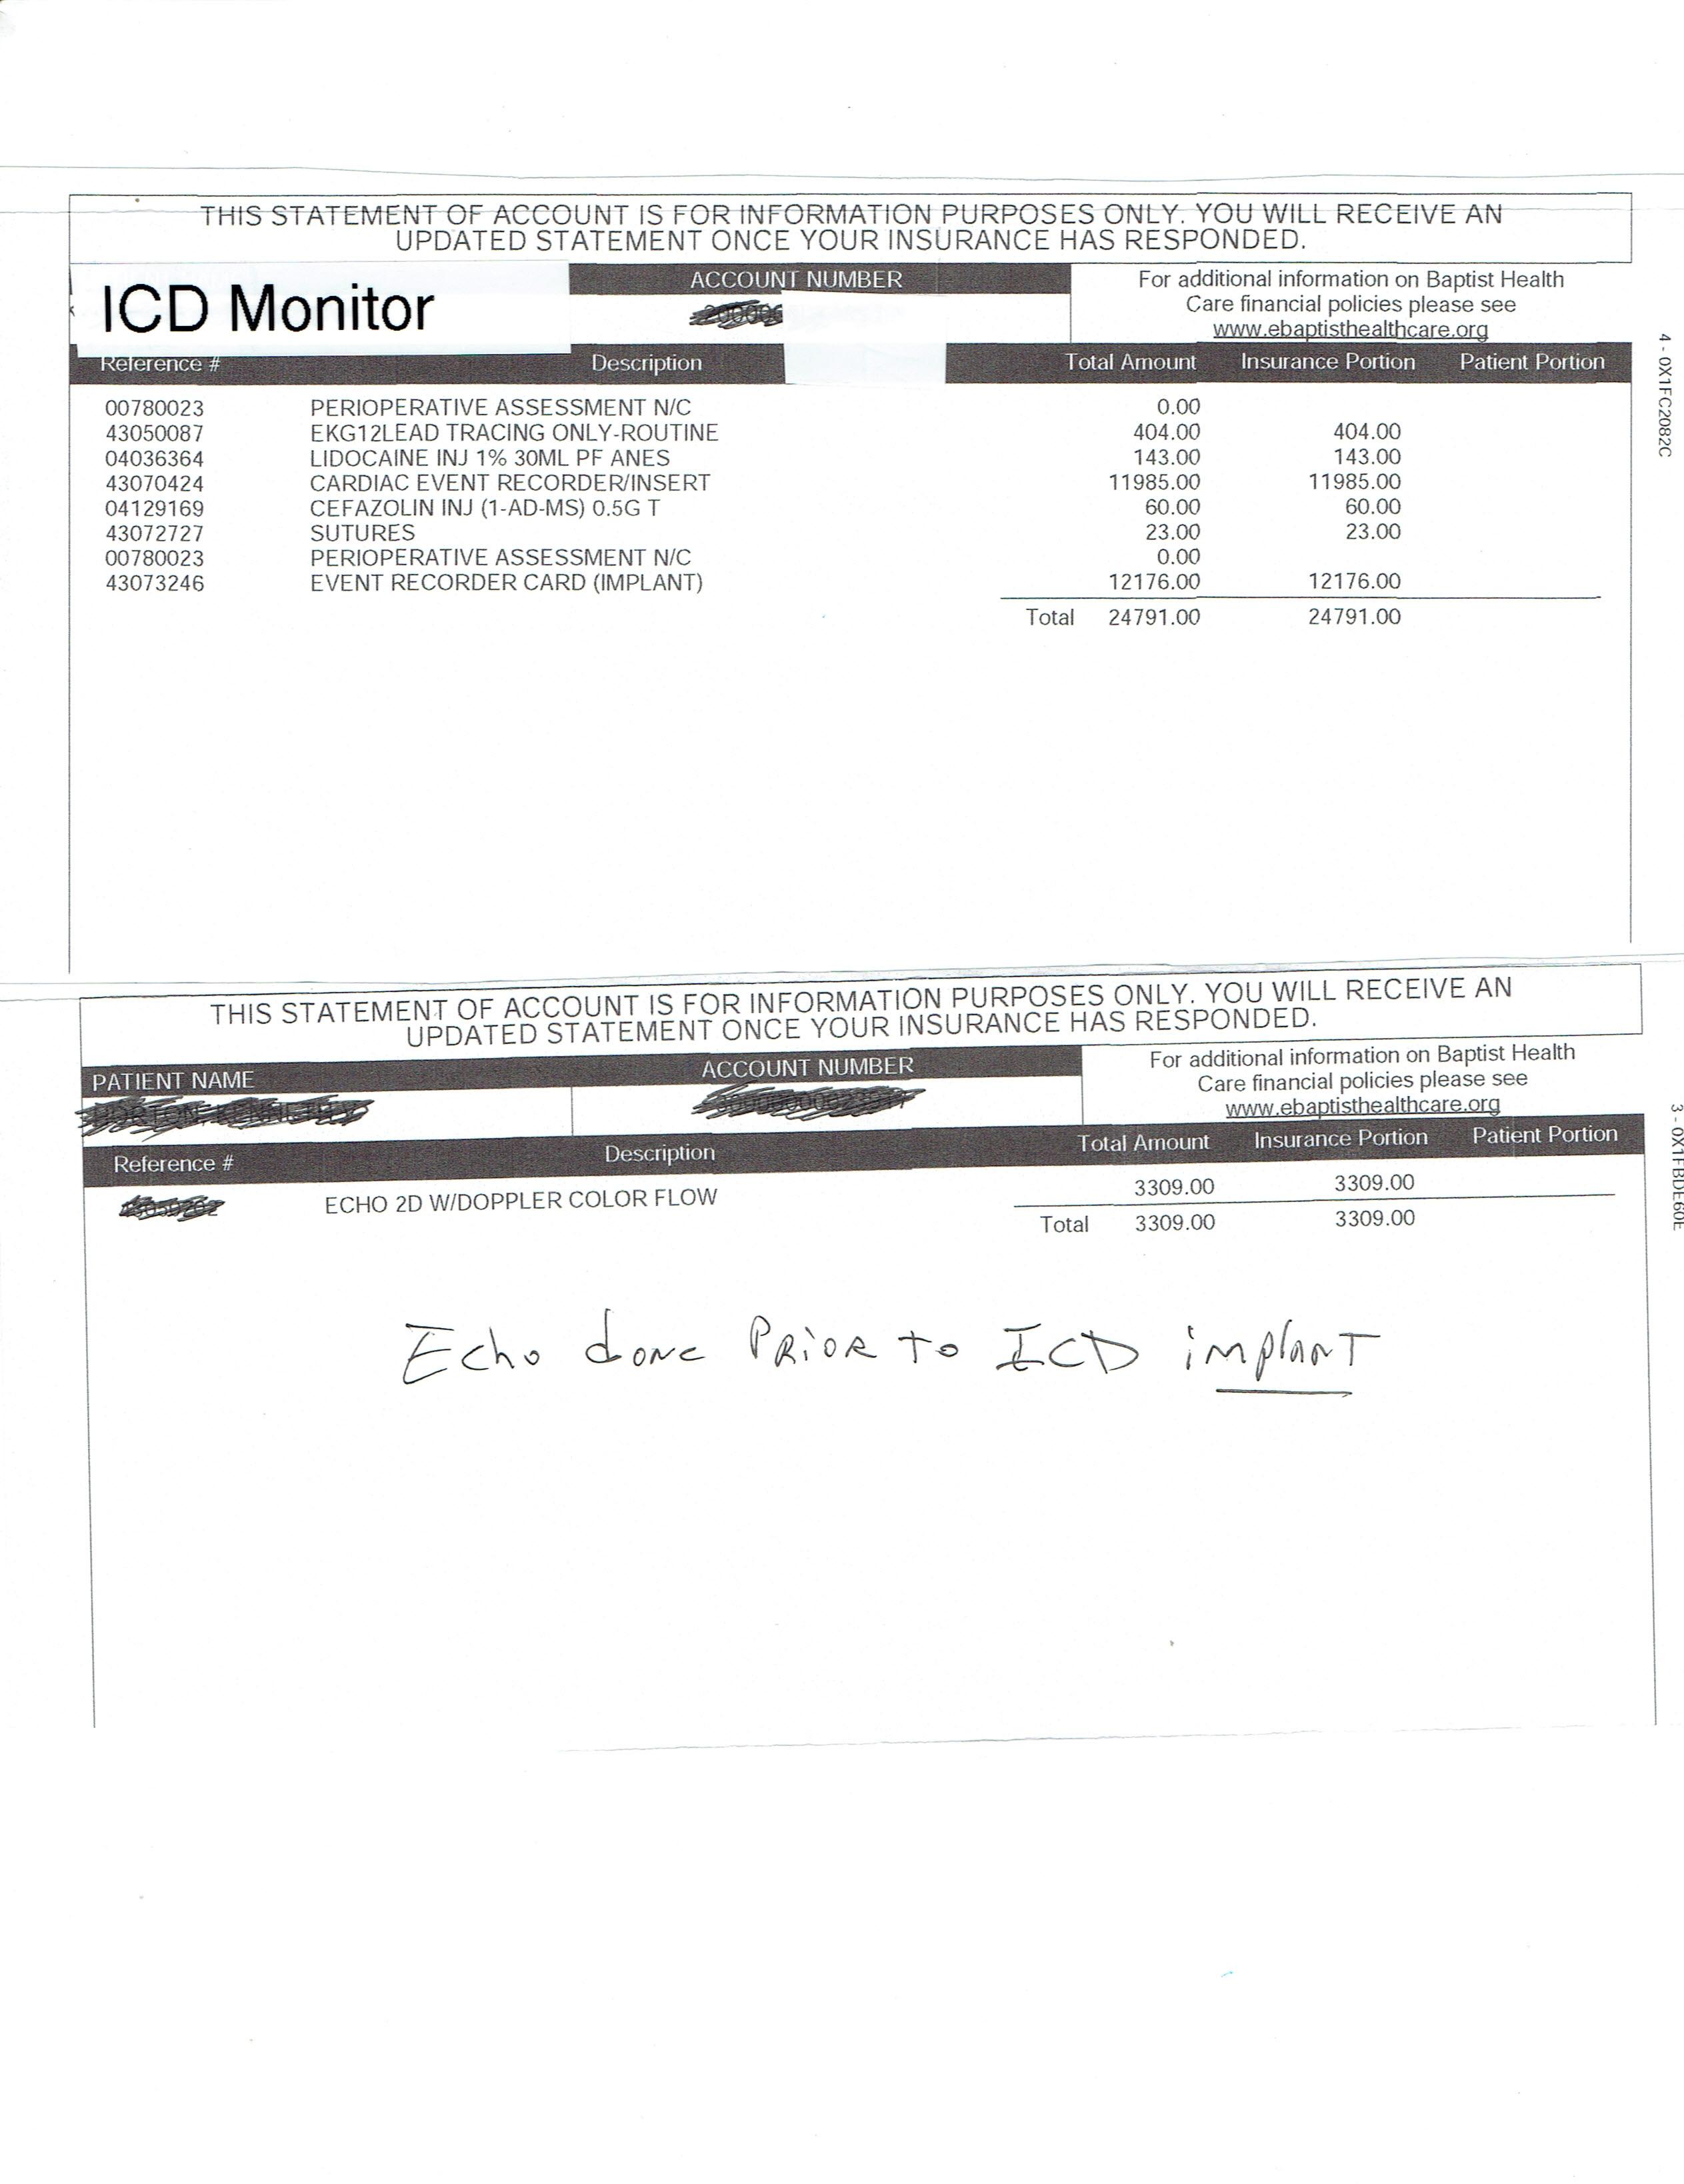 ICD MONITOR04012018_0001